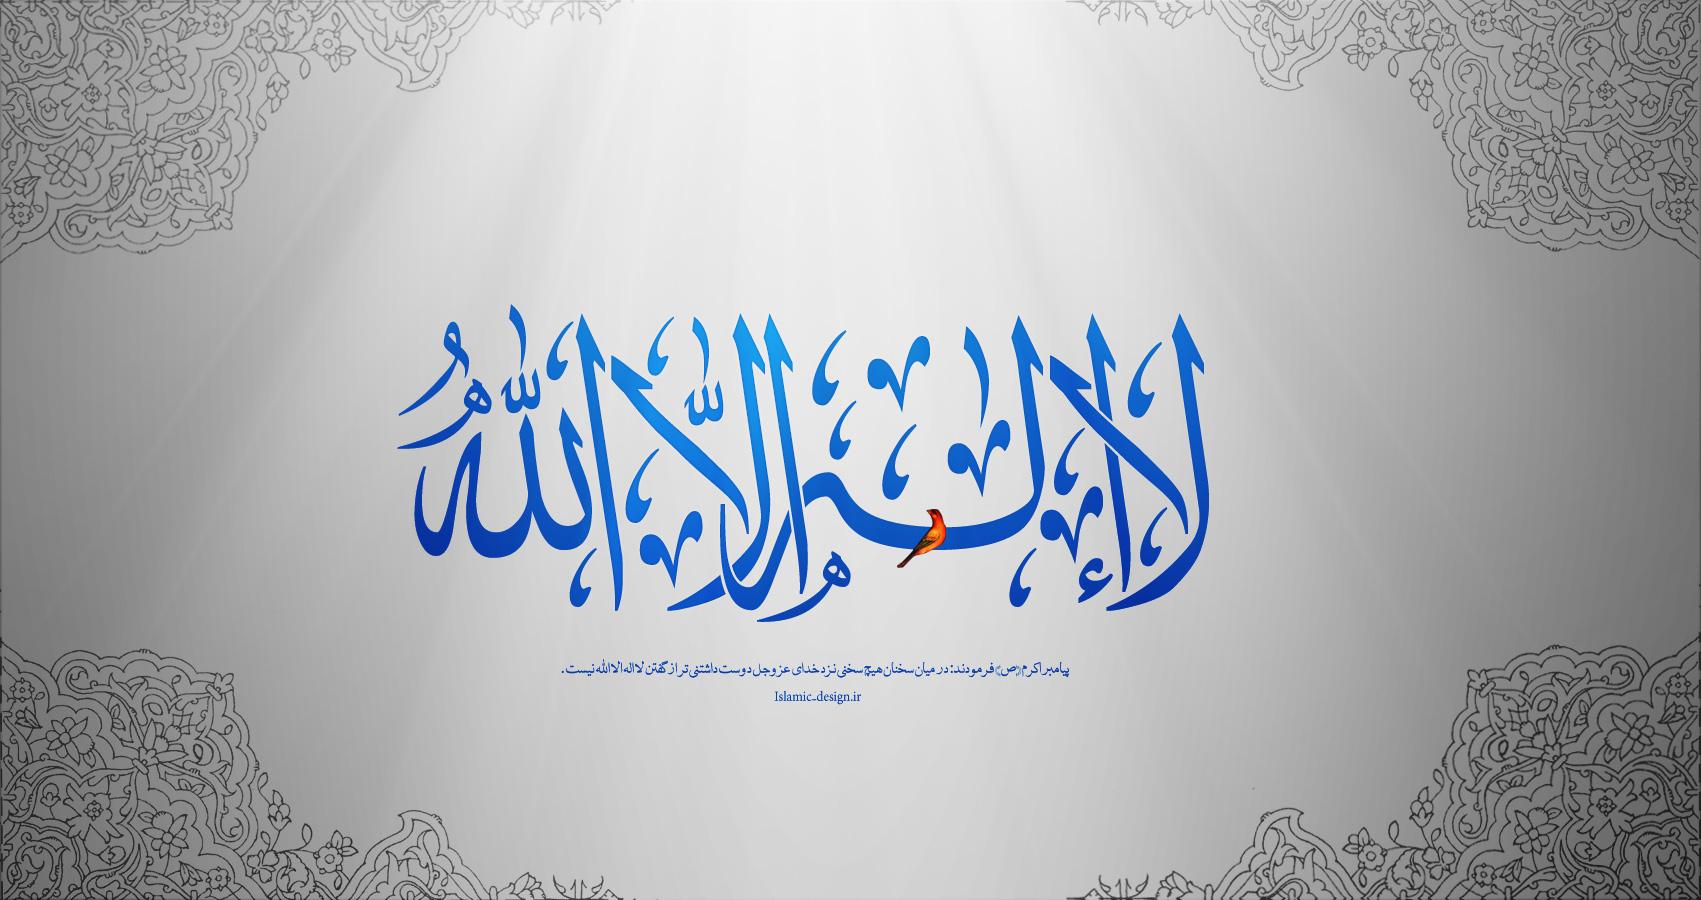 islamic-design.ir-123456767889--tohid